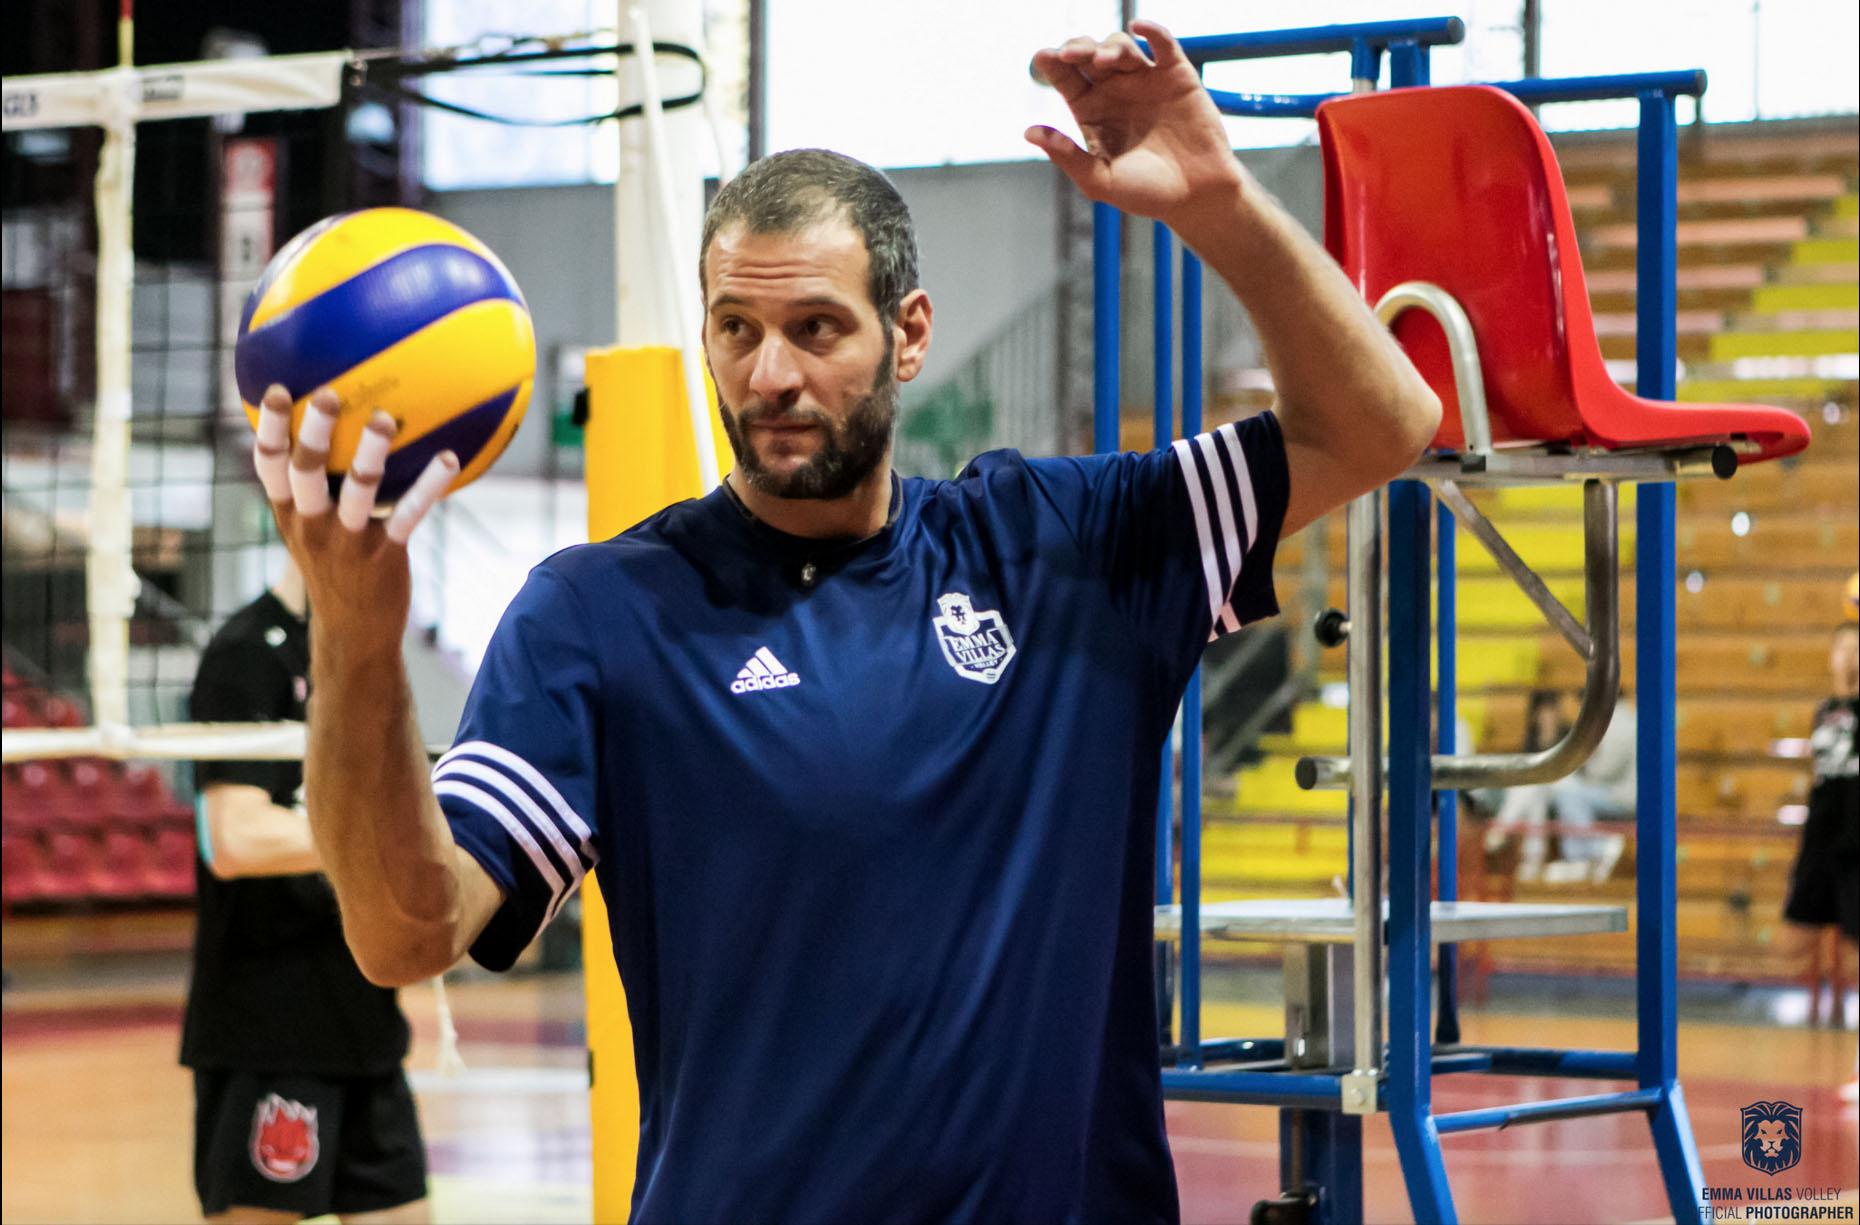 foto Andrea Di Marco-emma-villas-volley-pallavolo